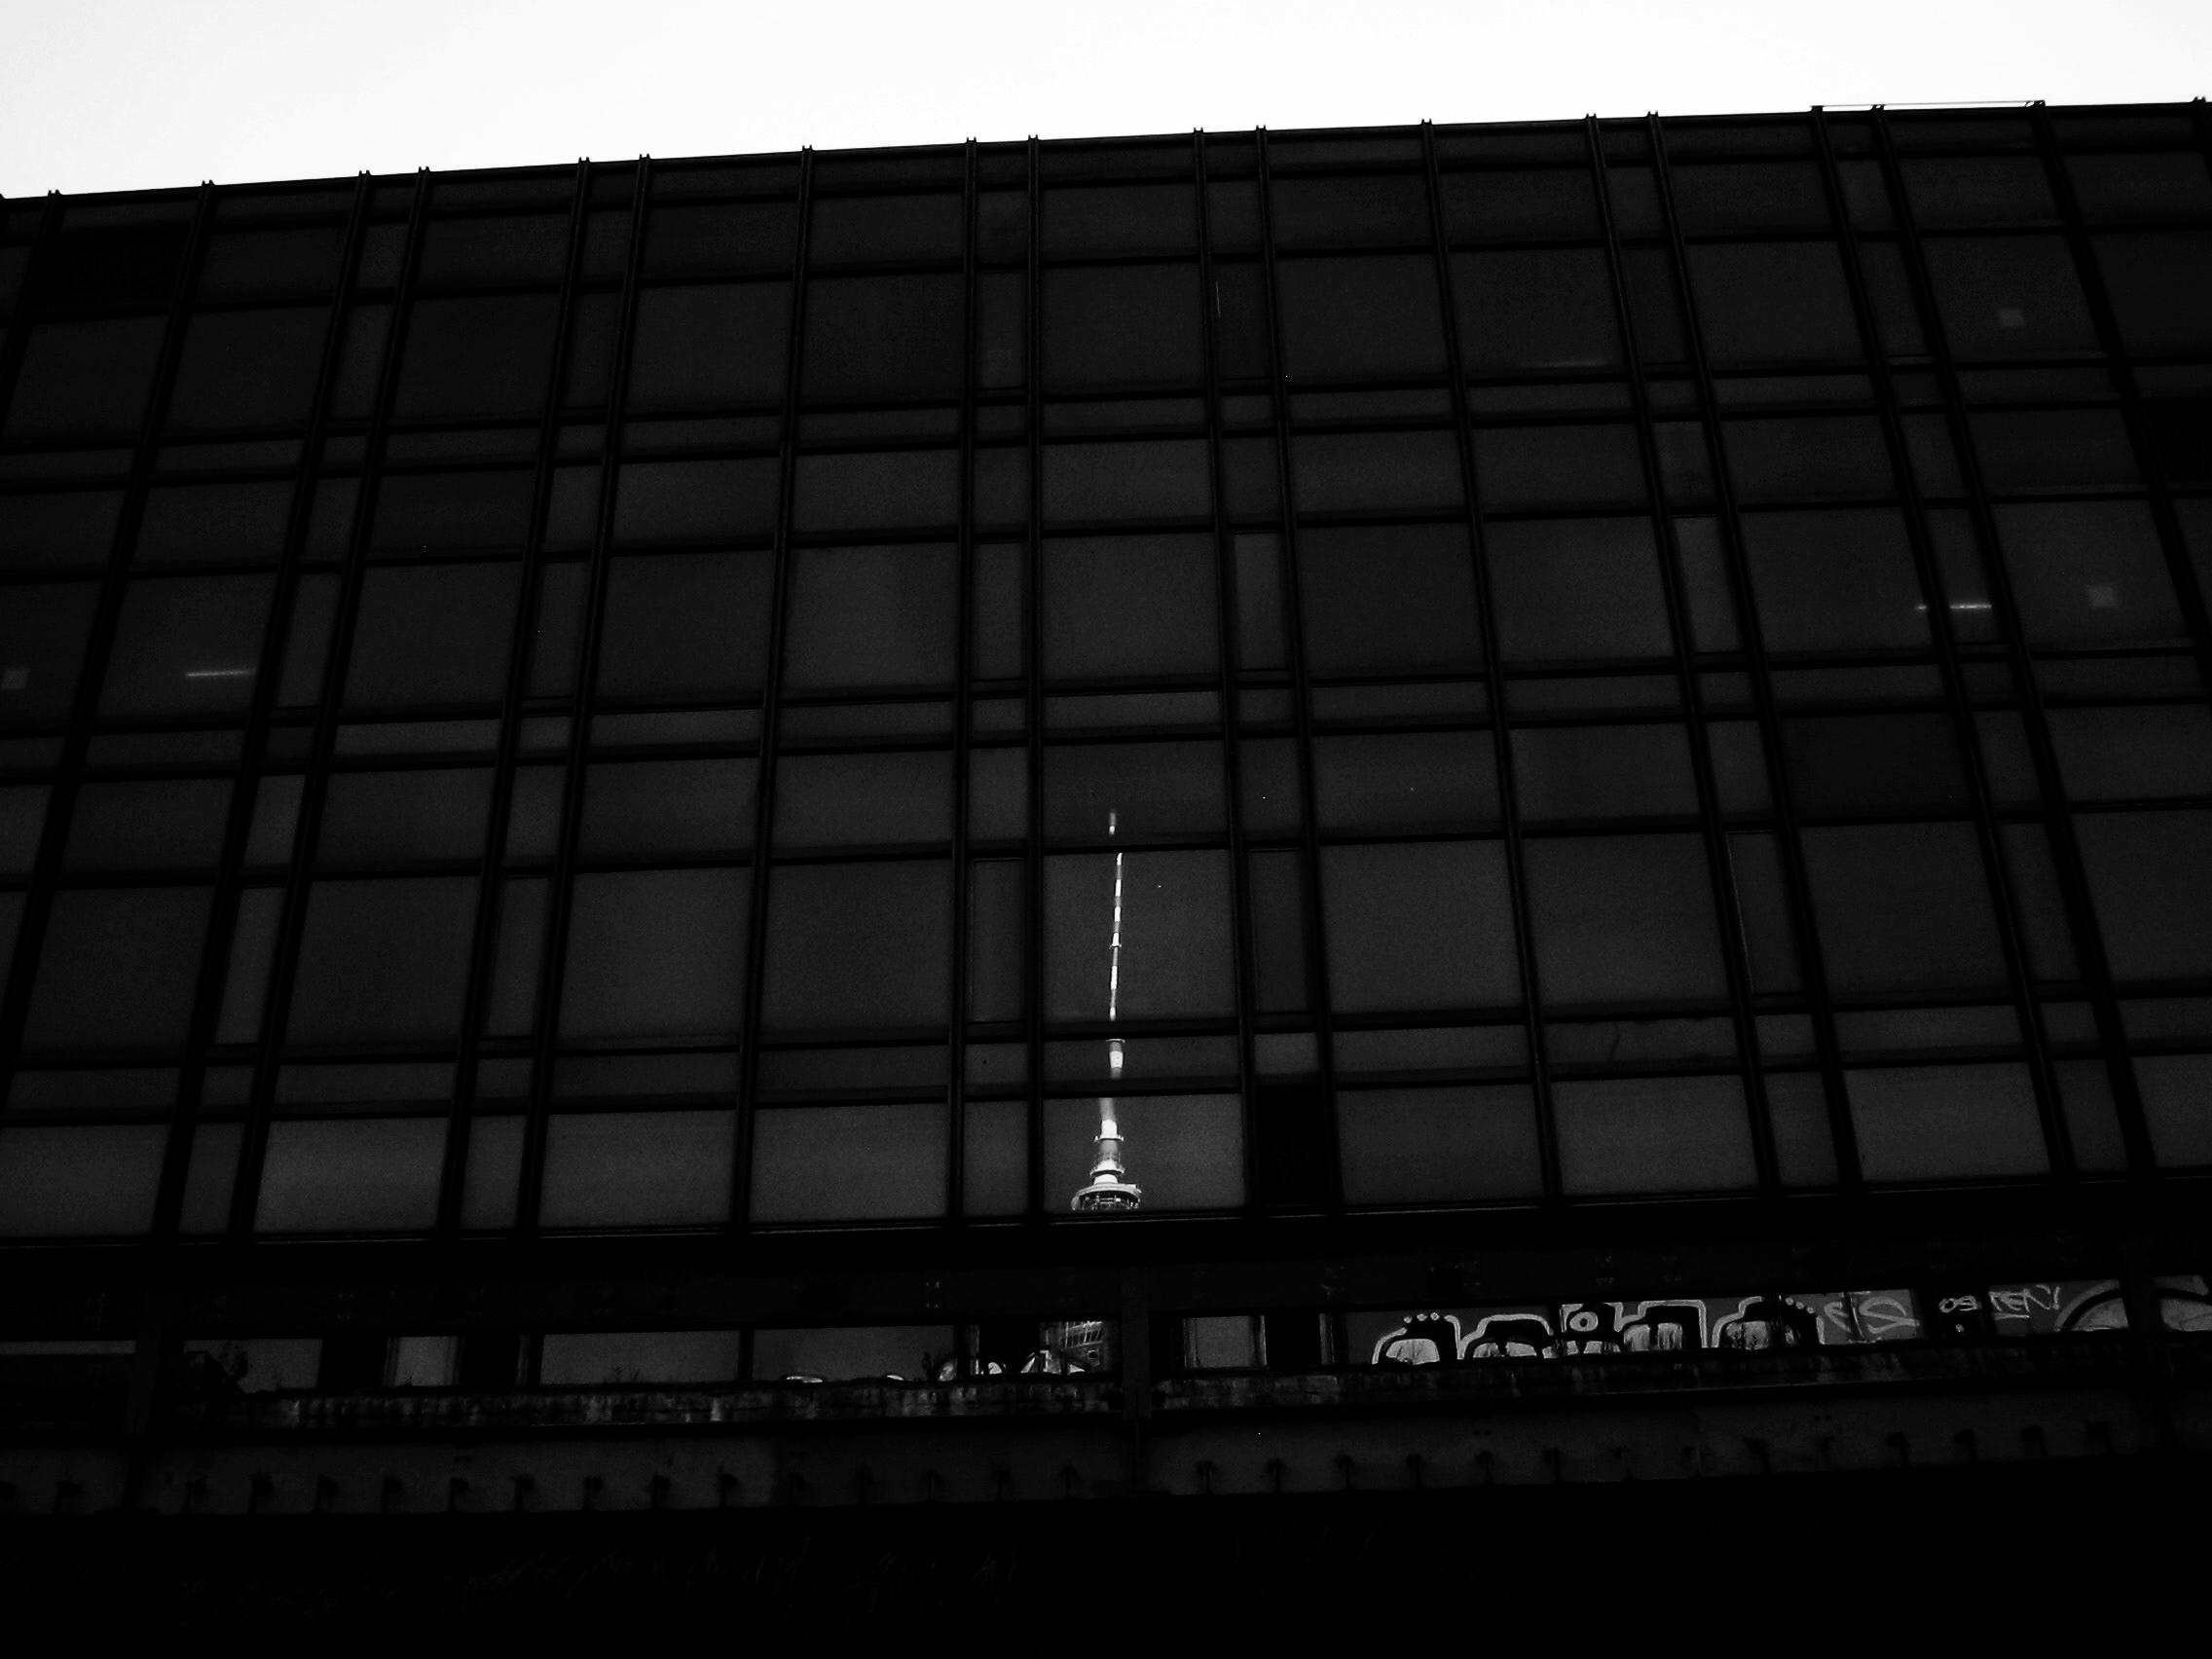 BERLIN 08:05